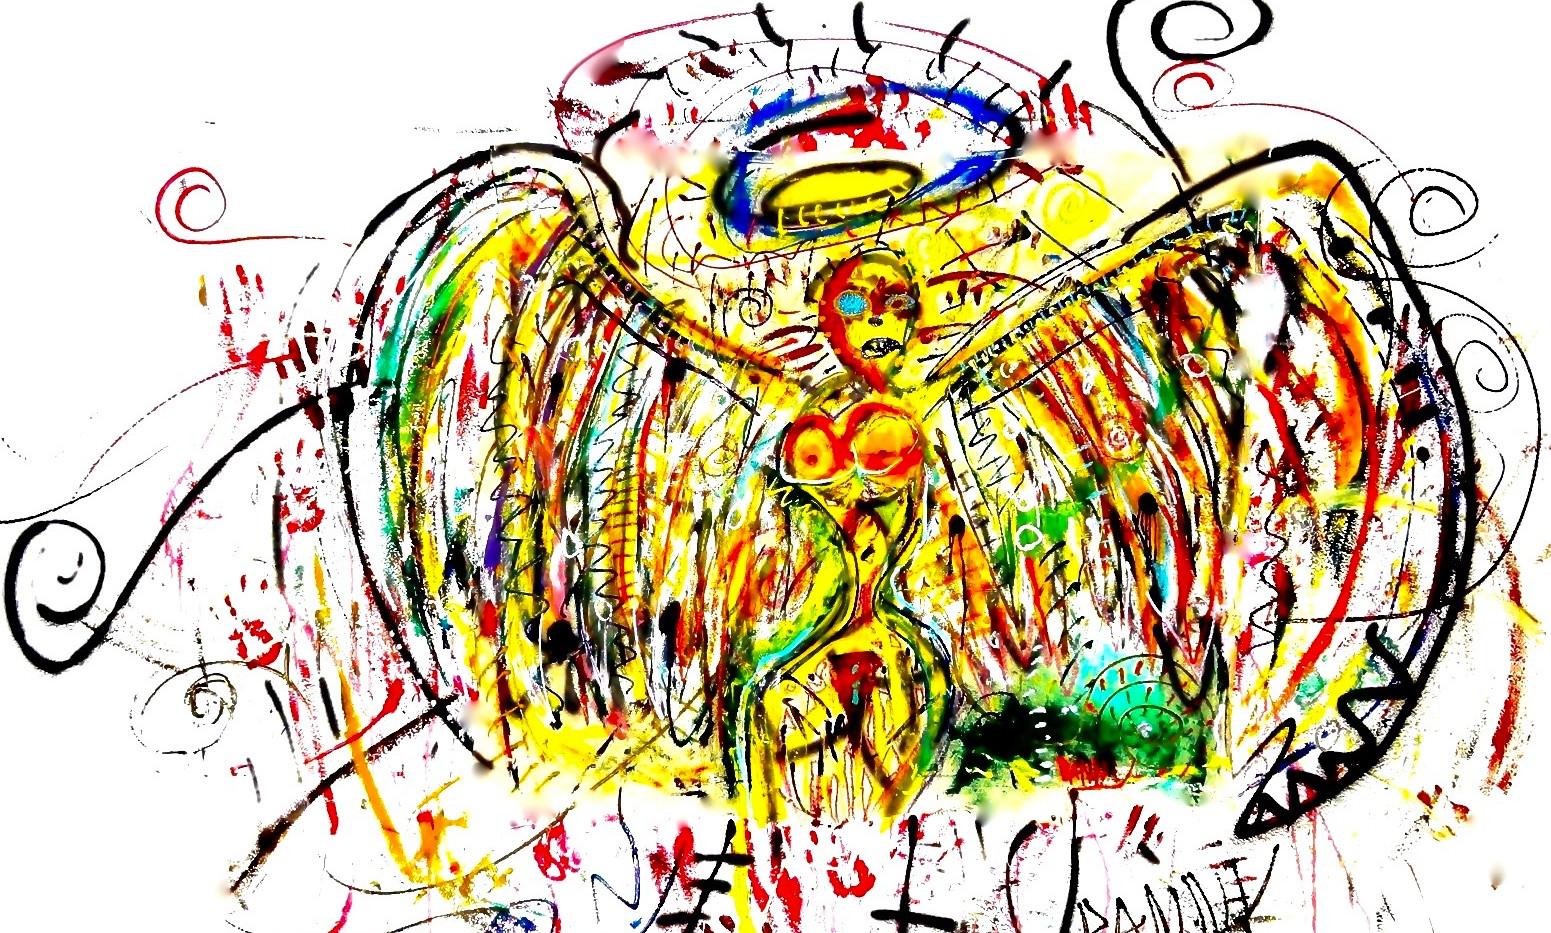 Angel de Basquiat. Mixed Media on Canvas.